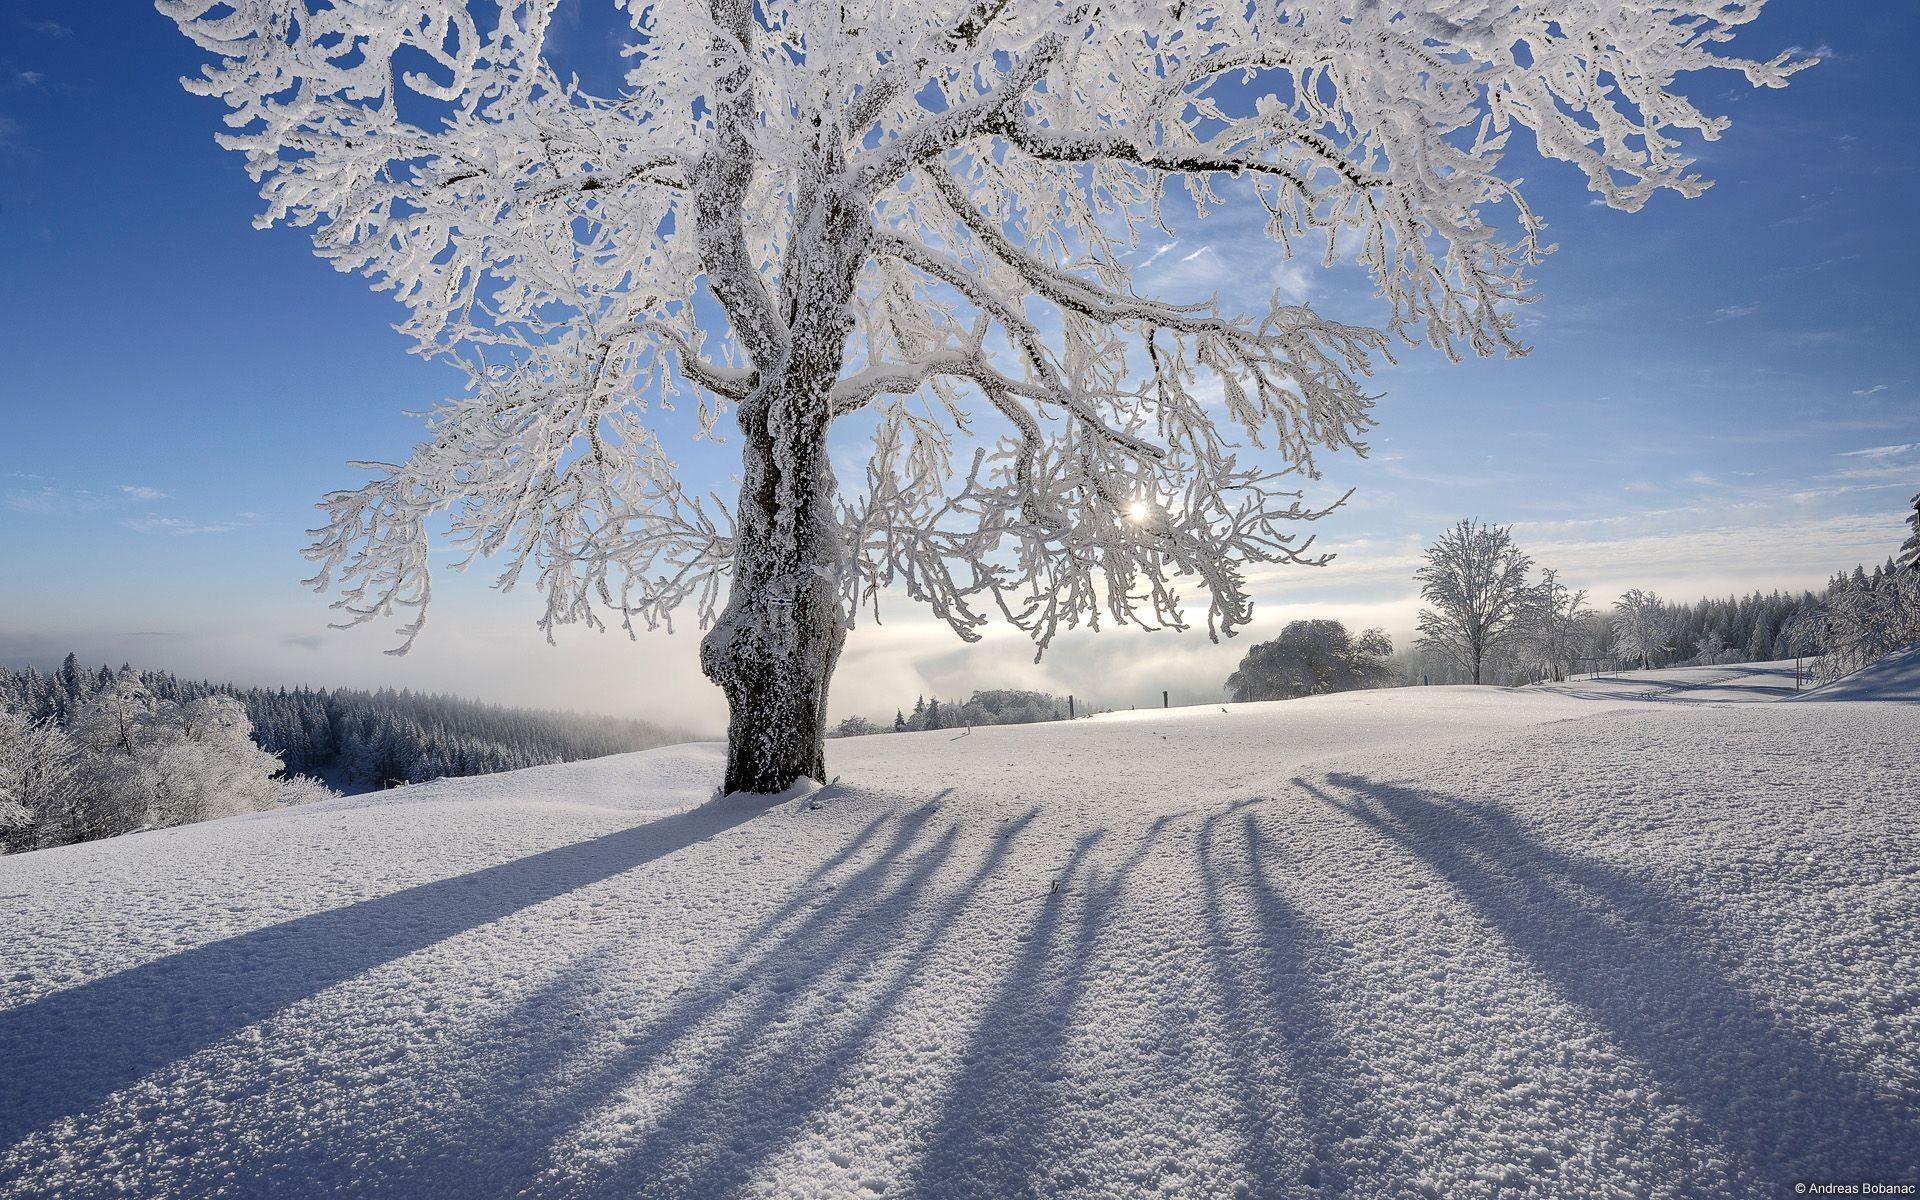 winter-and-christmas-desktop-backgrounds-for-mac.jpg